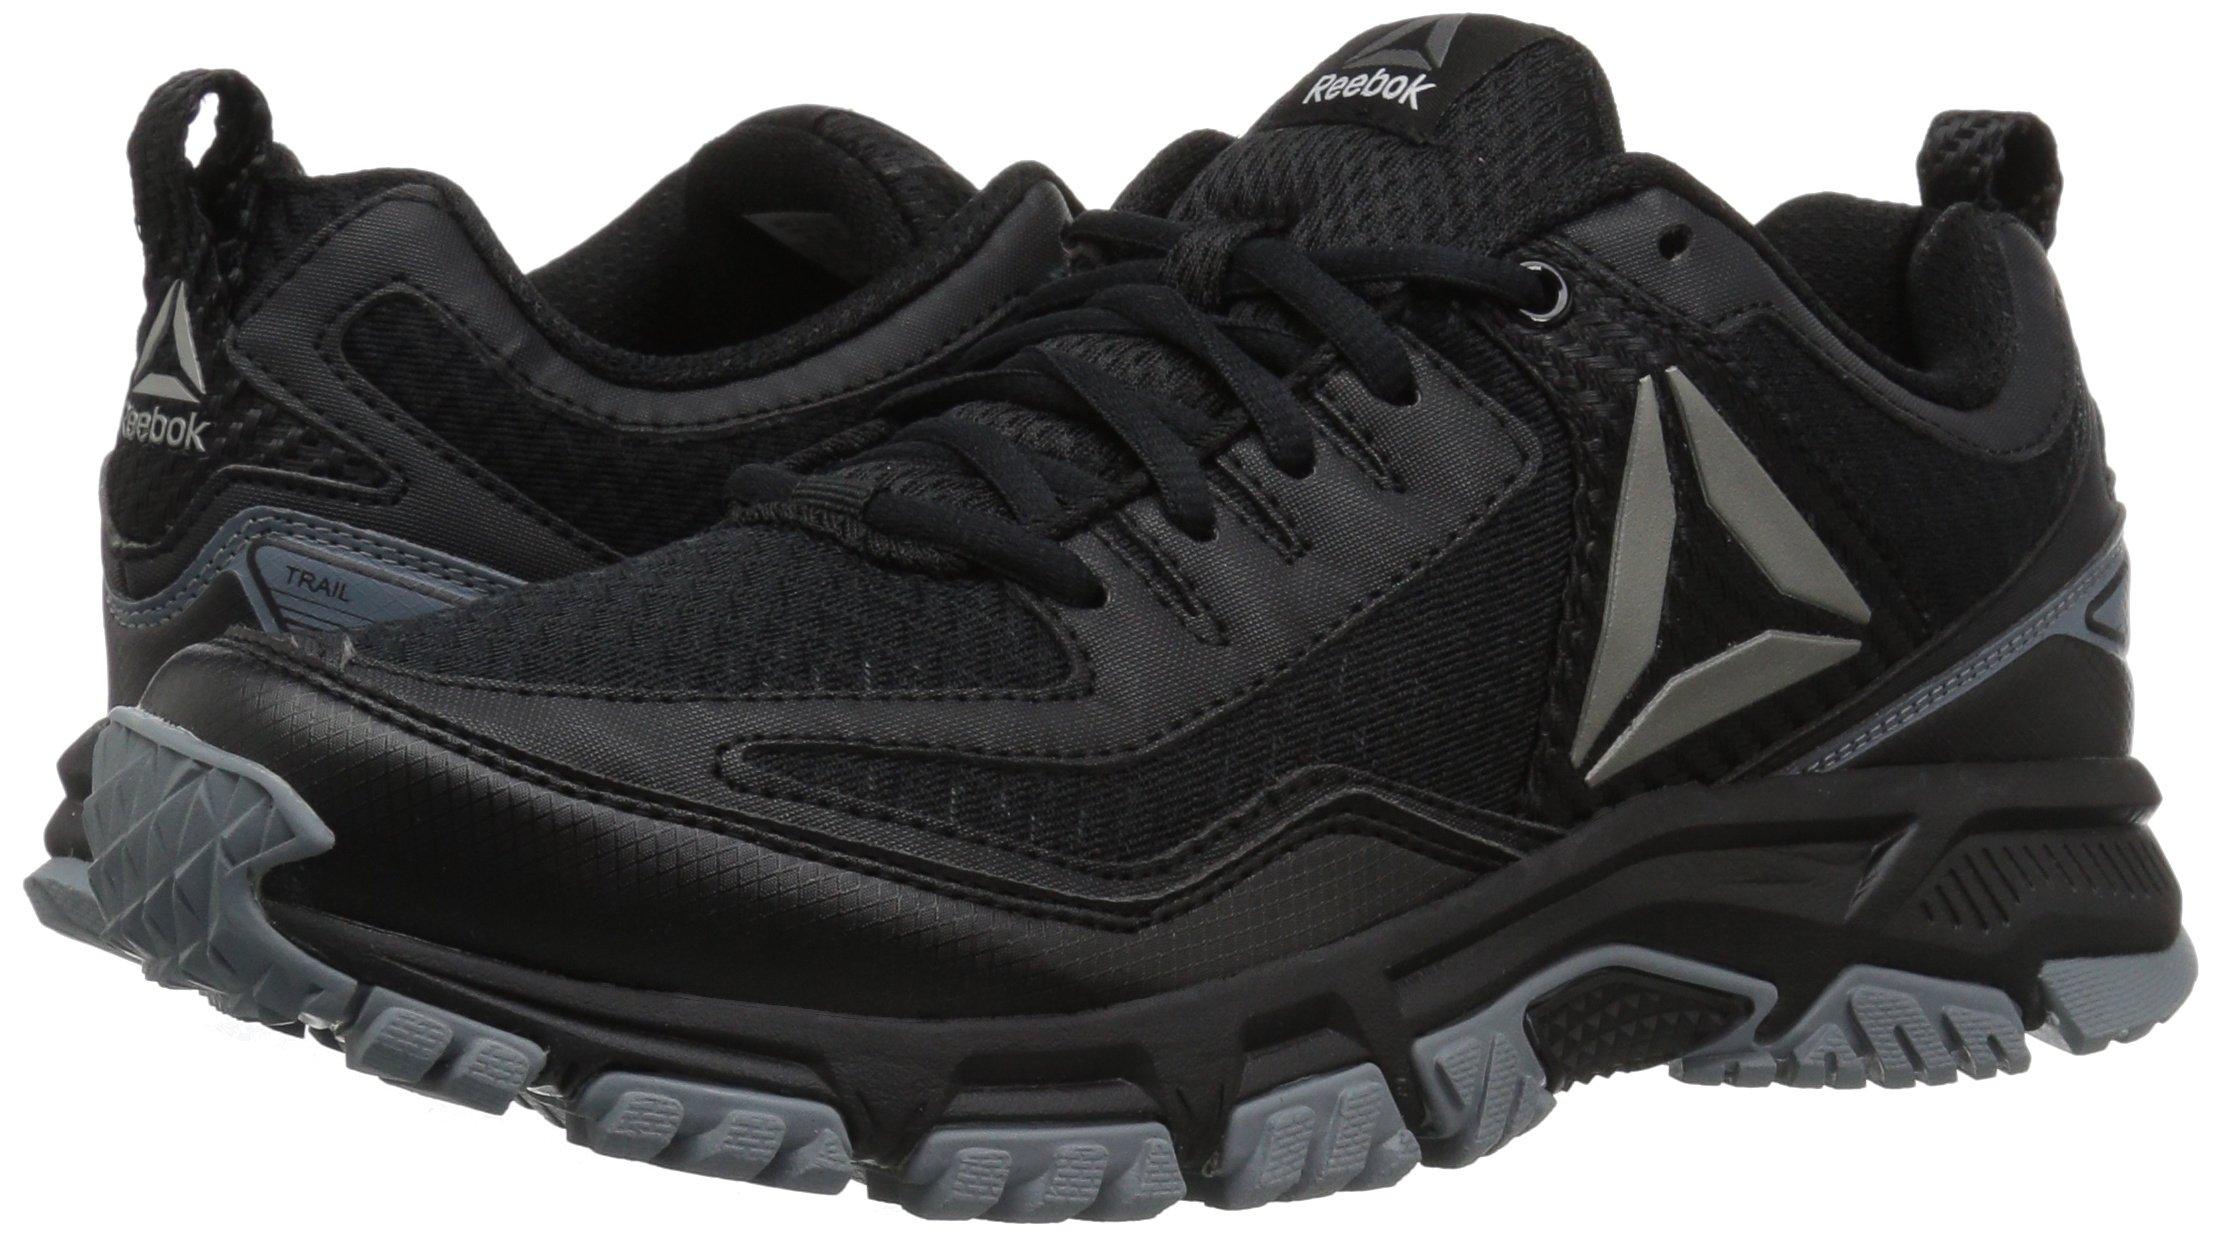 3de65c778229 Reebok - Reebok BS5697   Men s Ridgerider 2.0 Trail Runner